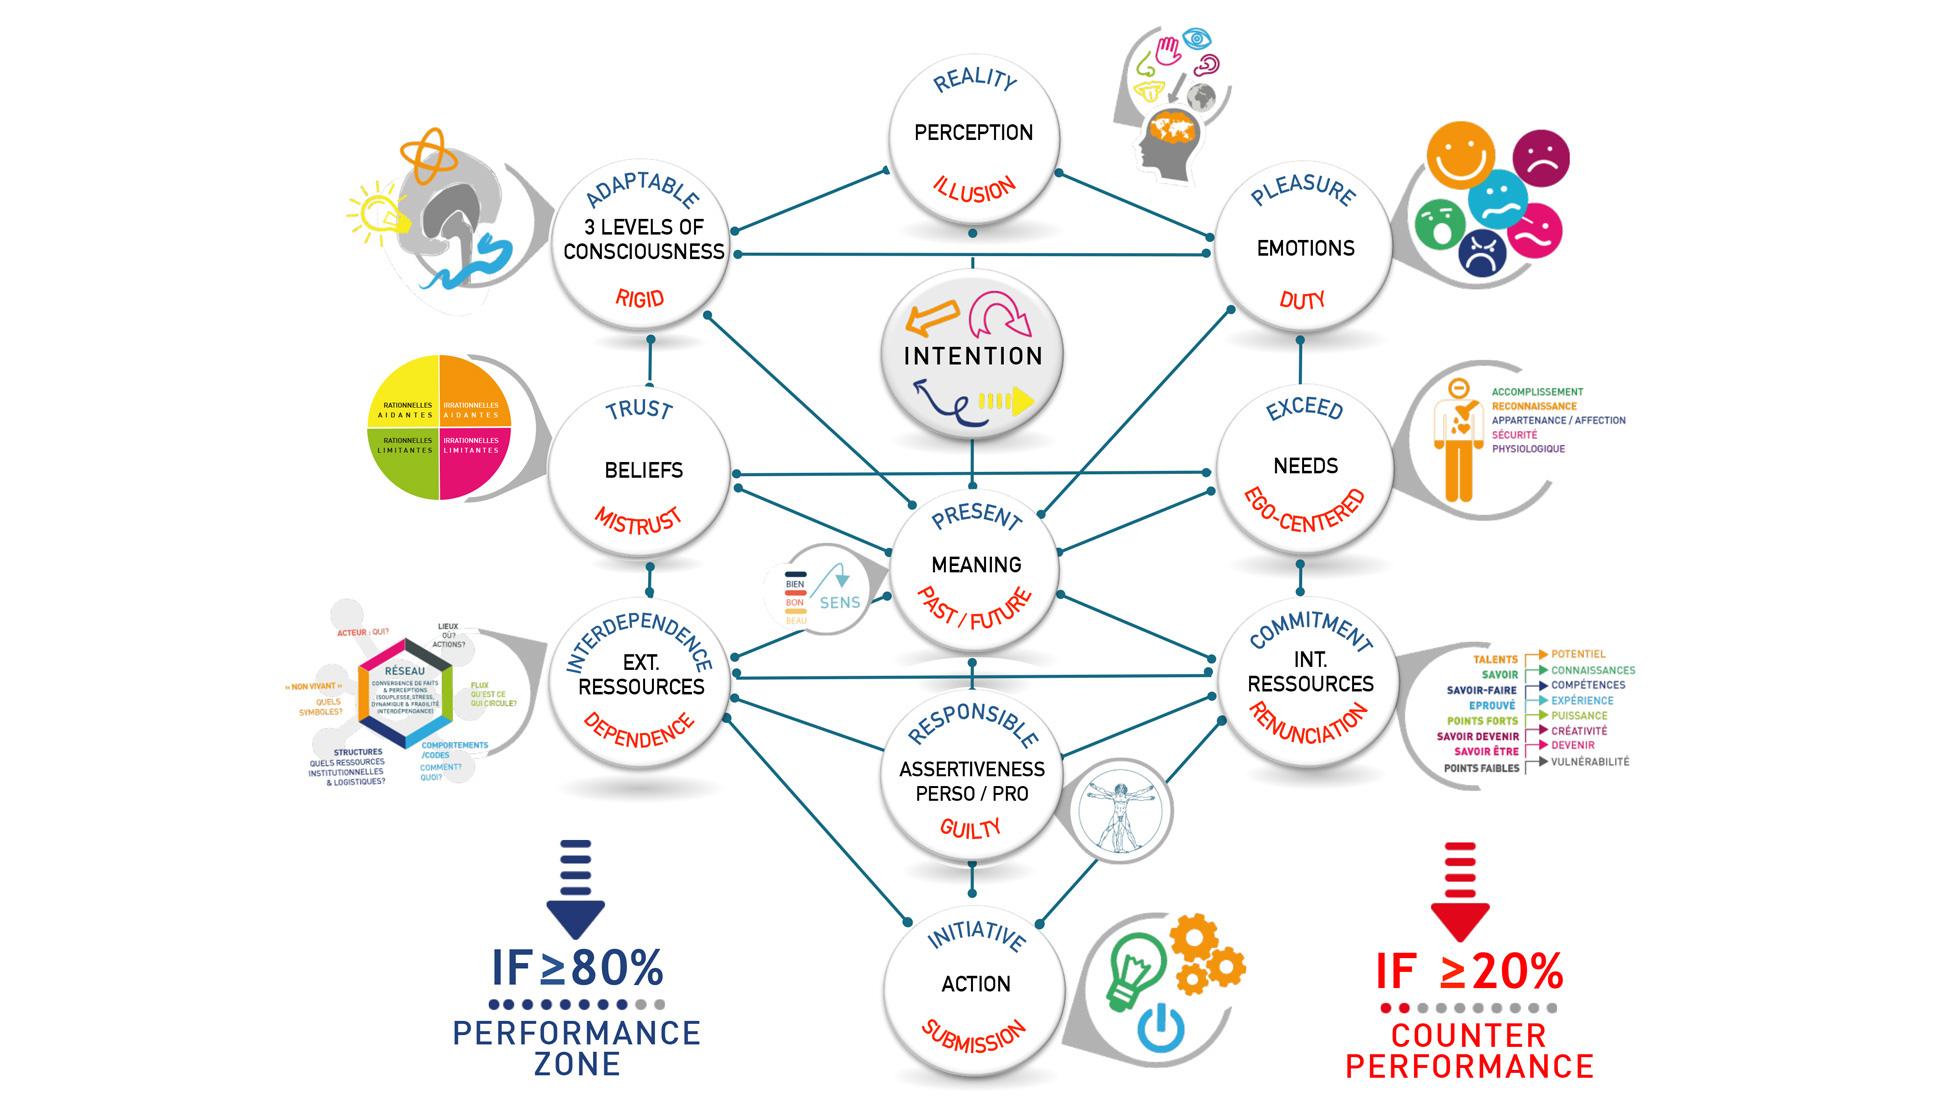 cv-expert-behavioral-mechanisms-decision-making